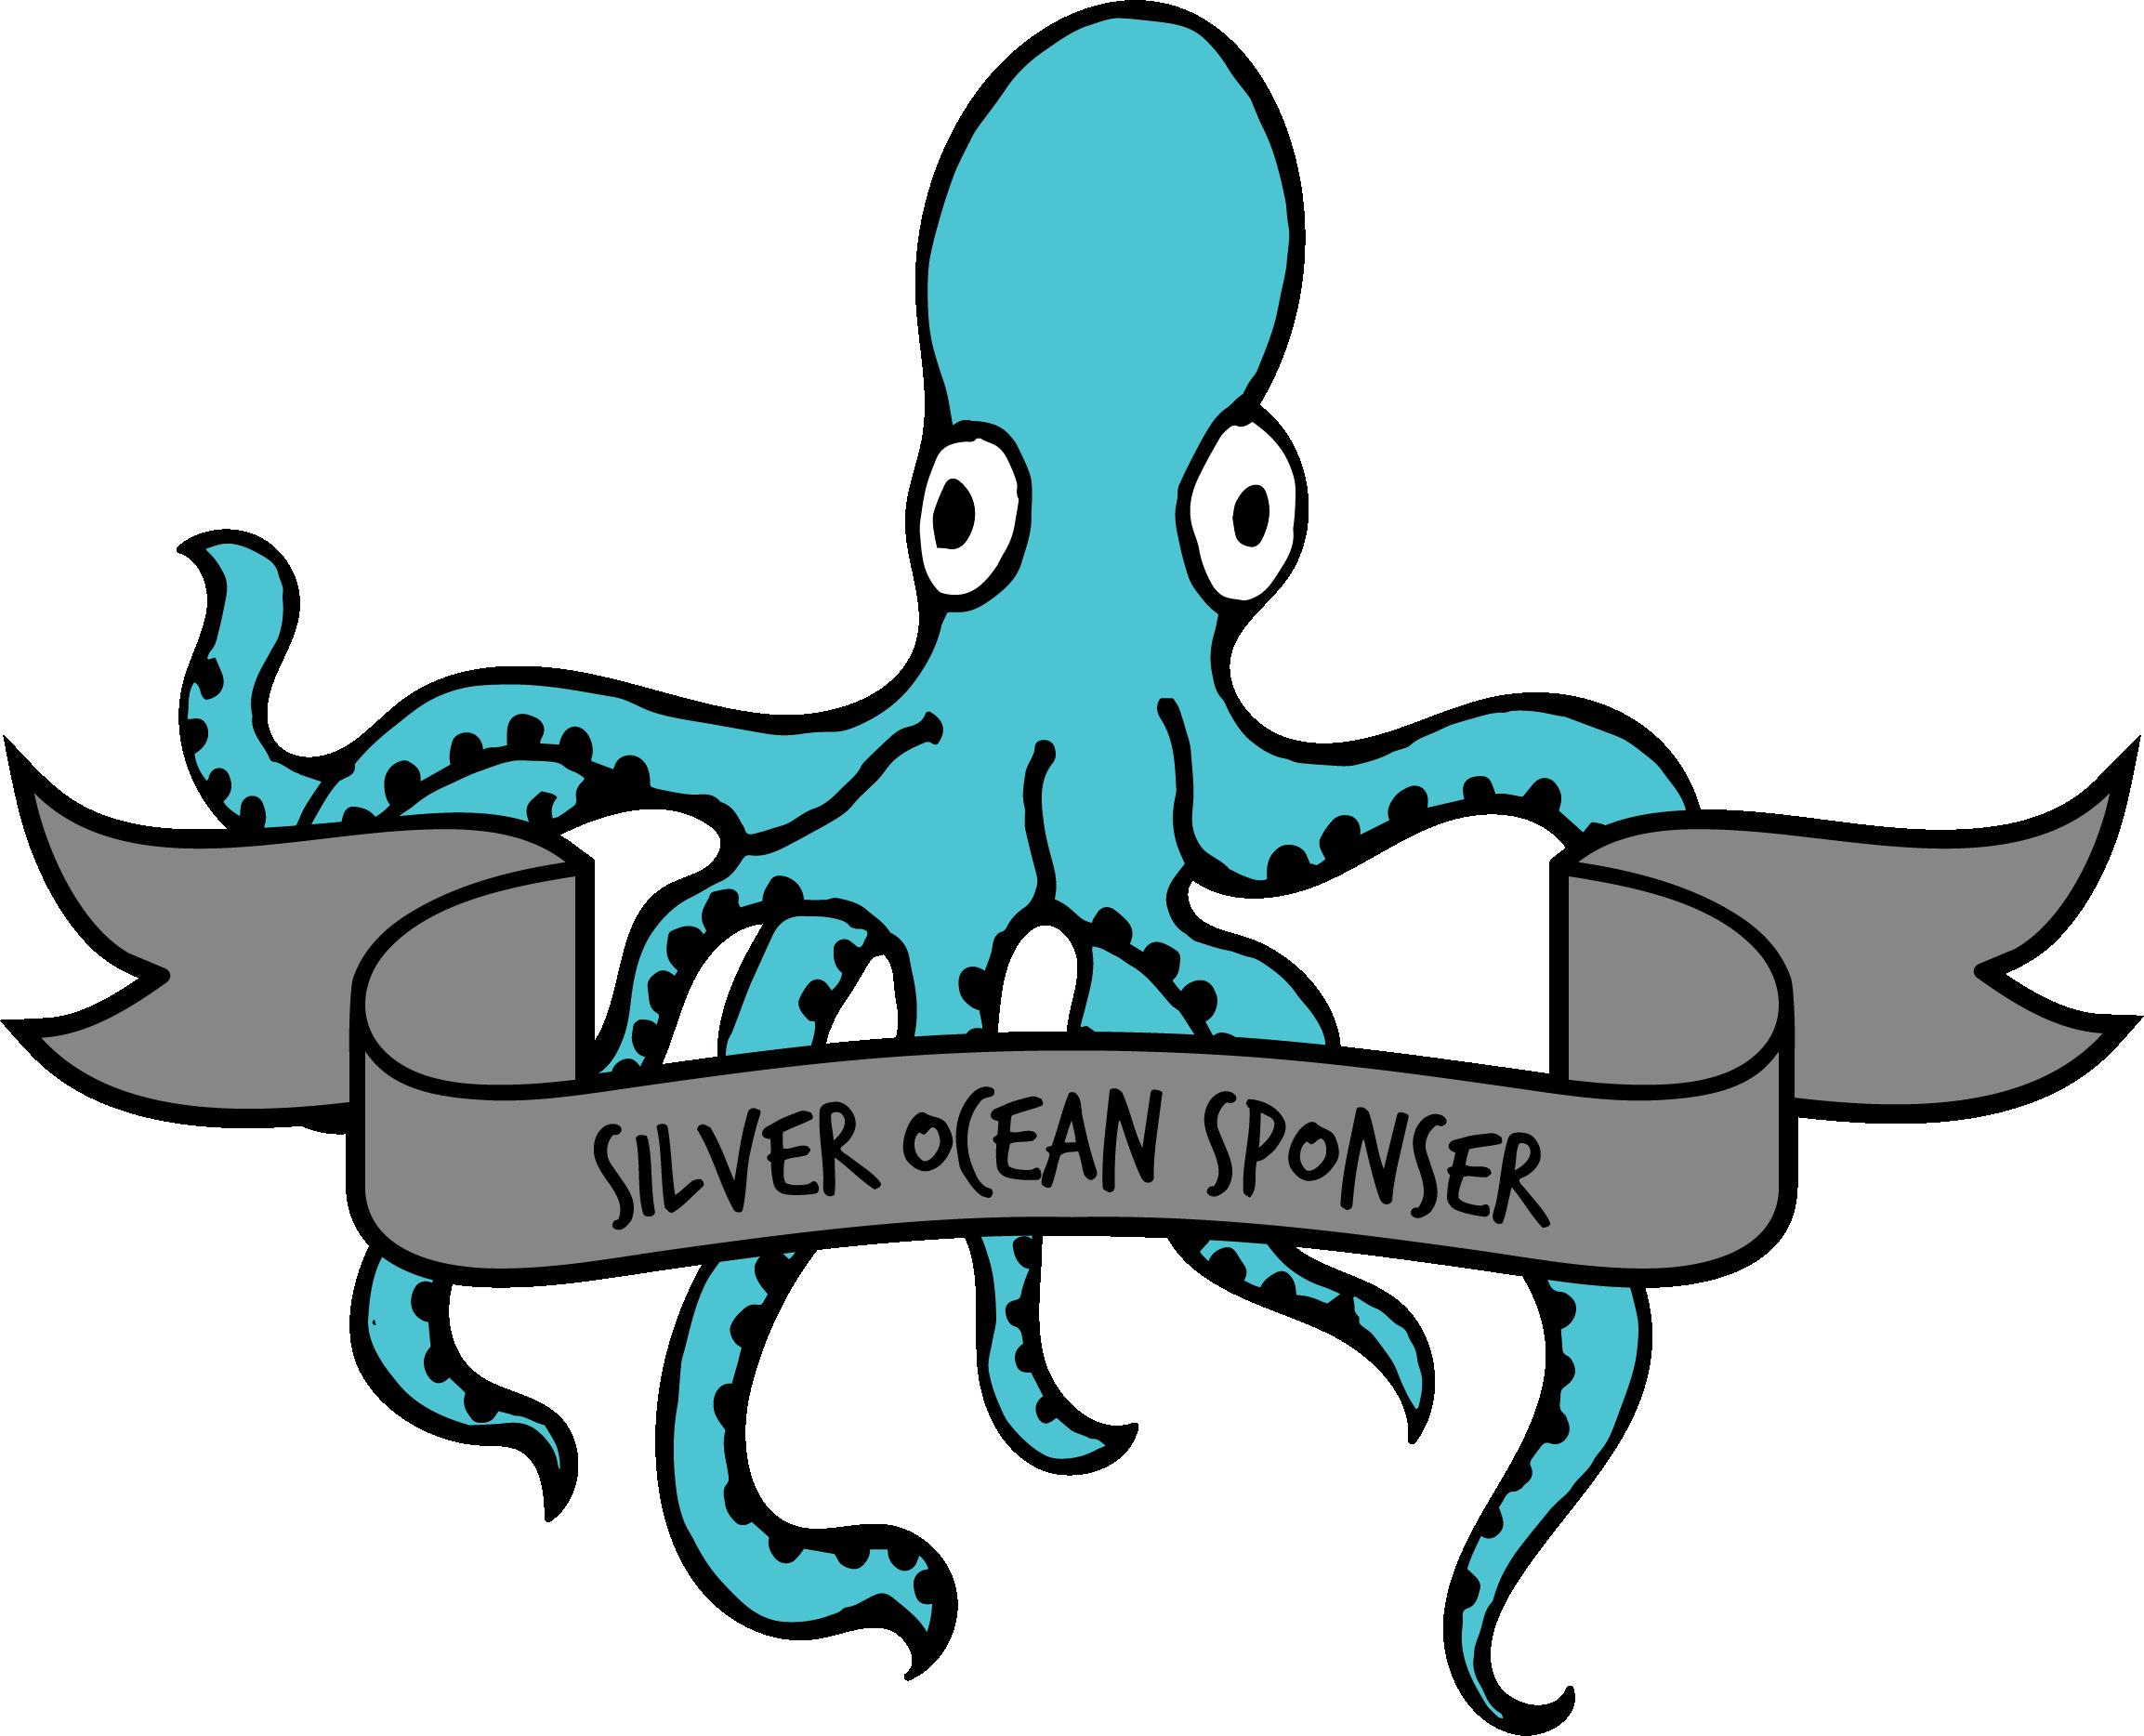 Silver Ocean Sponsor